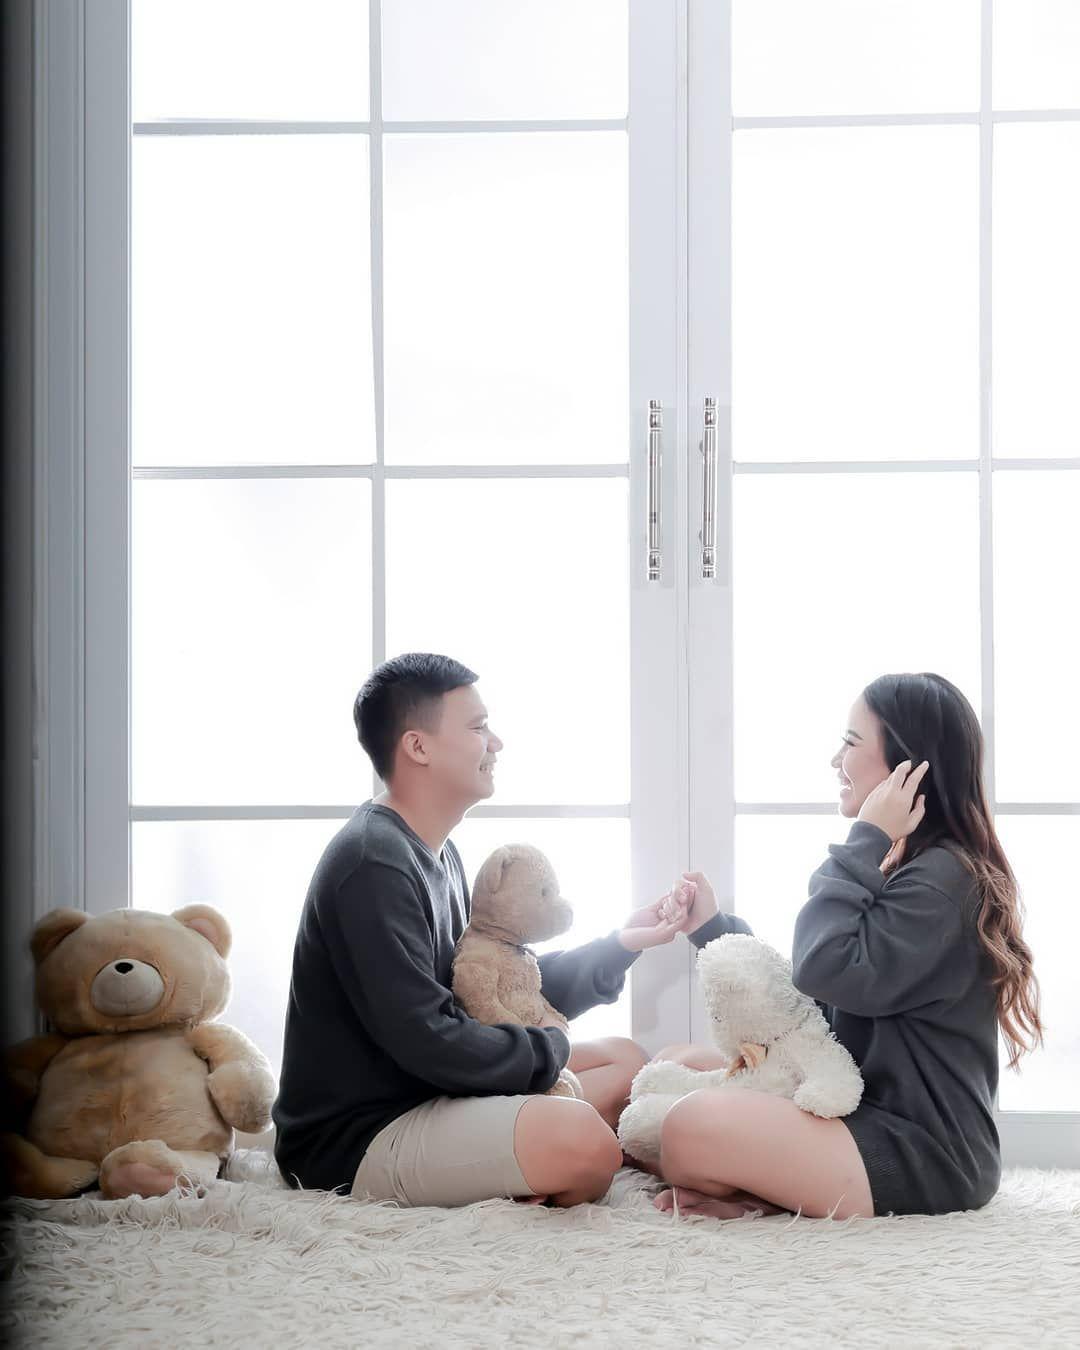 In House 1 31 Oktober 2019 Datang Dan Nikmati Promo Decaption Photography Decaptionphotography Nikmati Harga Promo Prewedding Toddler Bed Toddler Home Decor